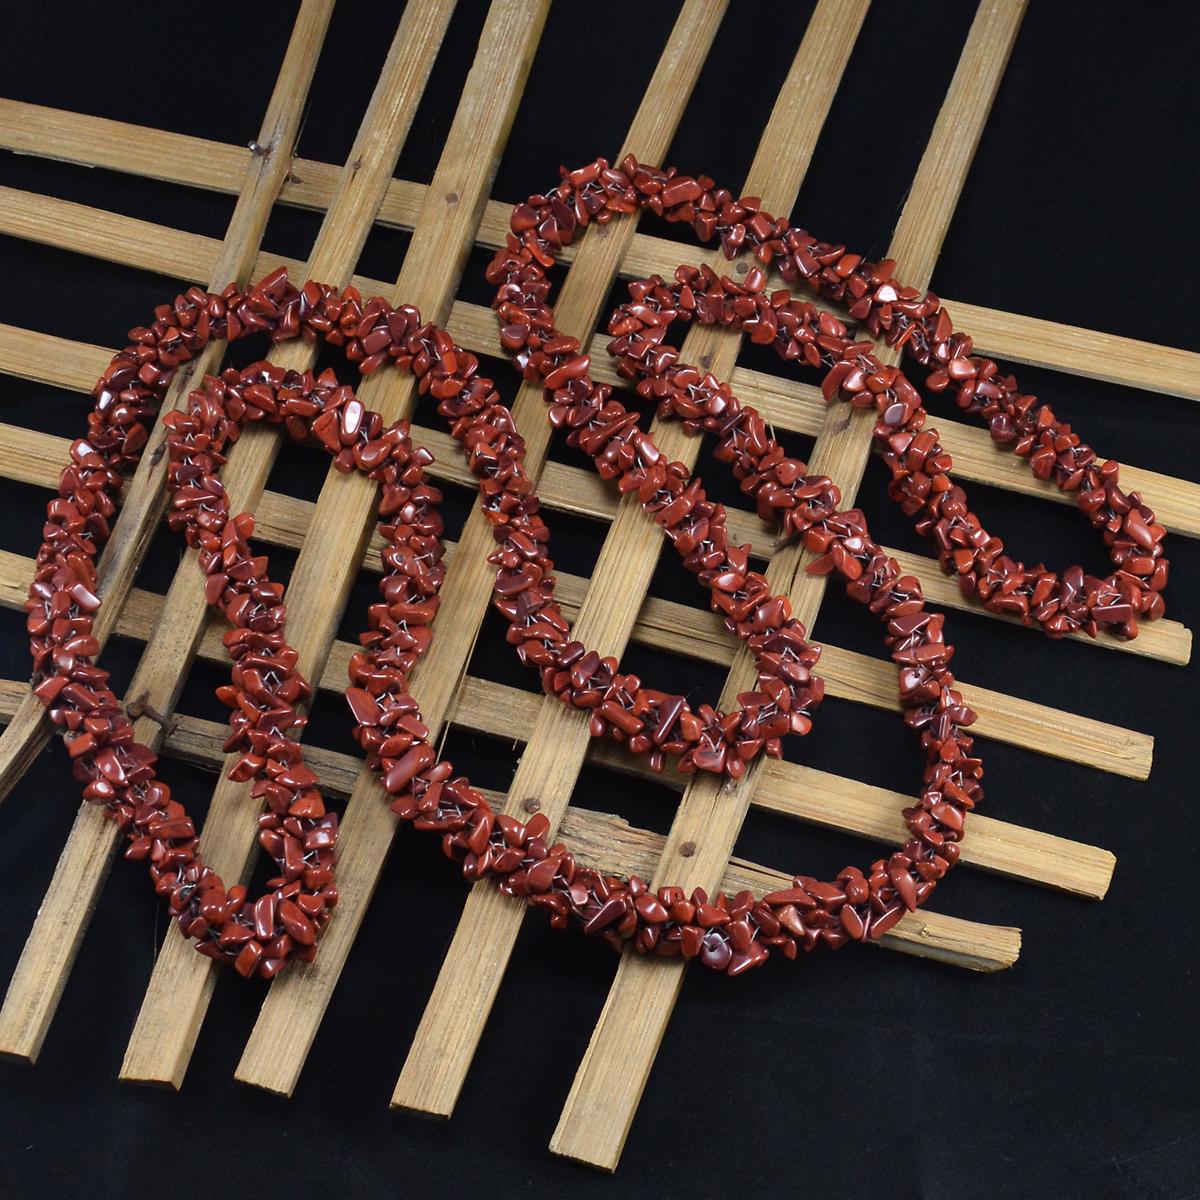 Red Jasper Gemstone Chips Necklace PG-156068